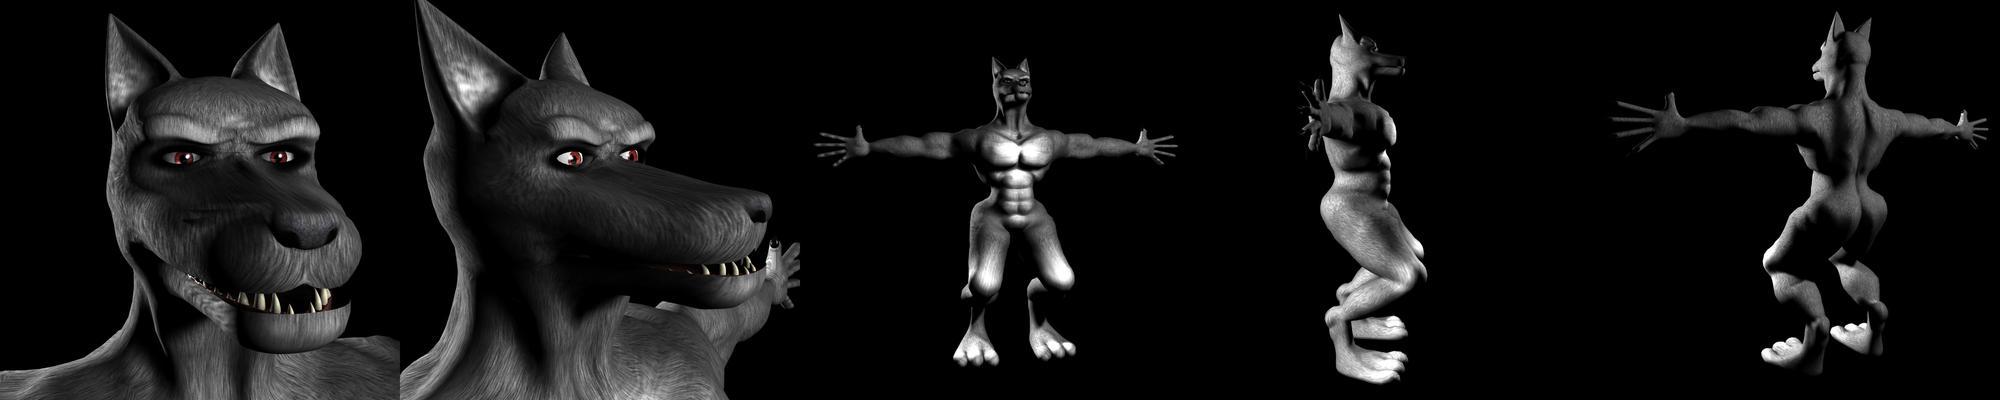 3d werewolf pics naked clip